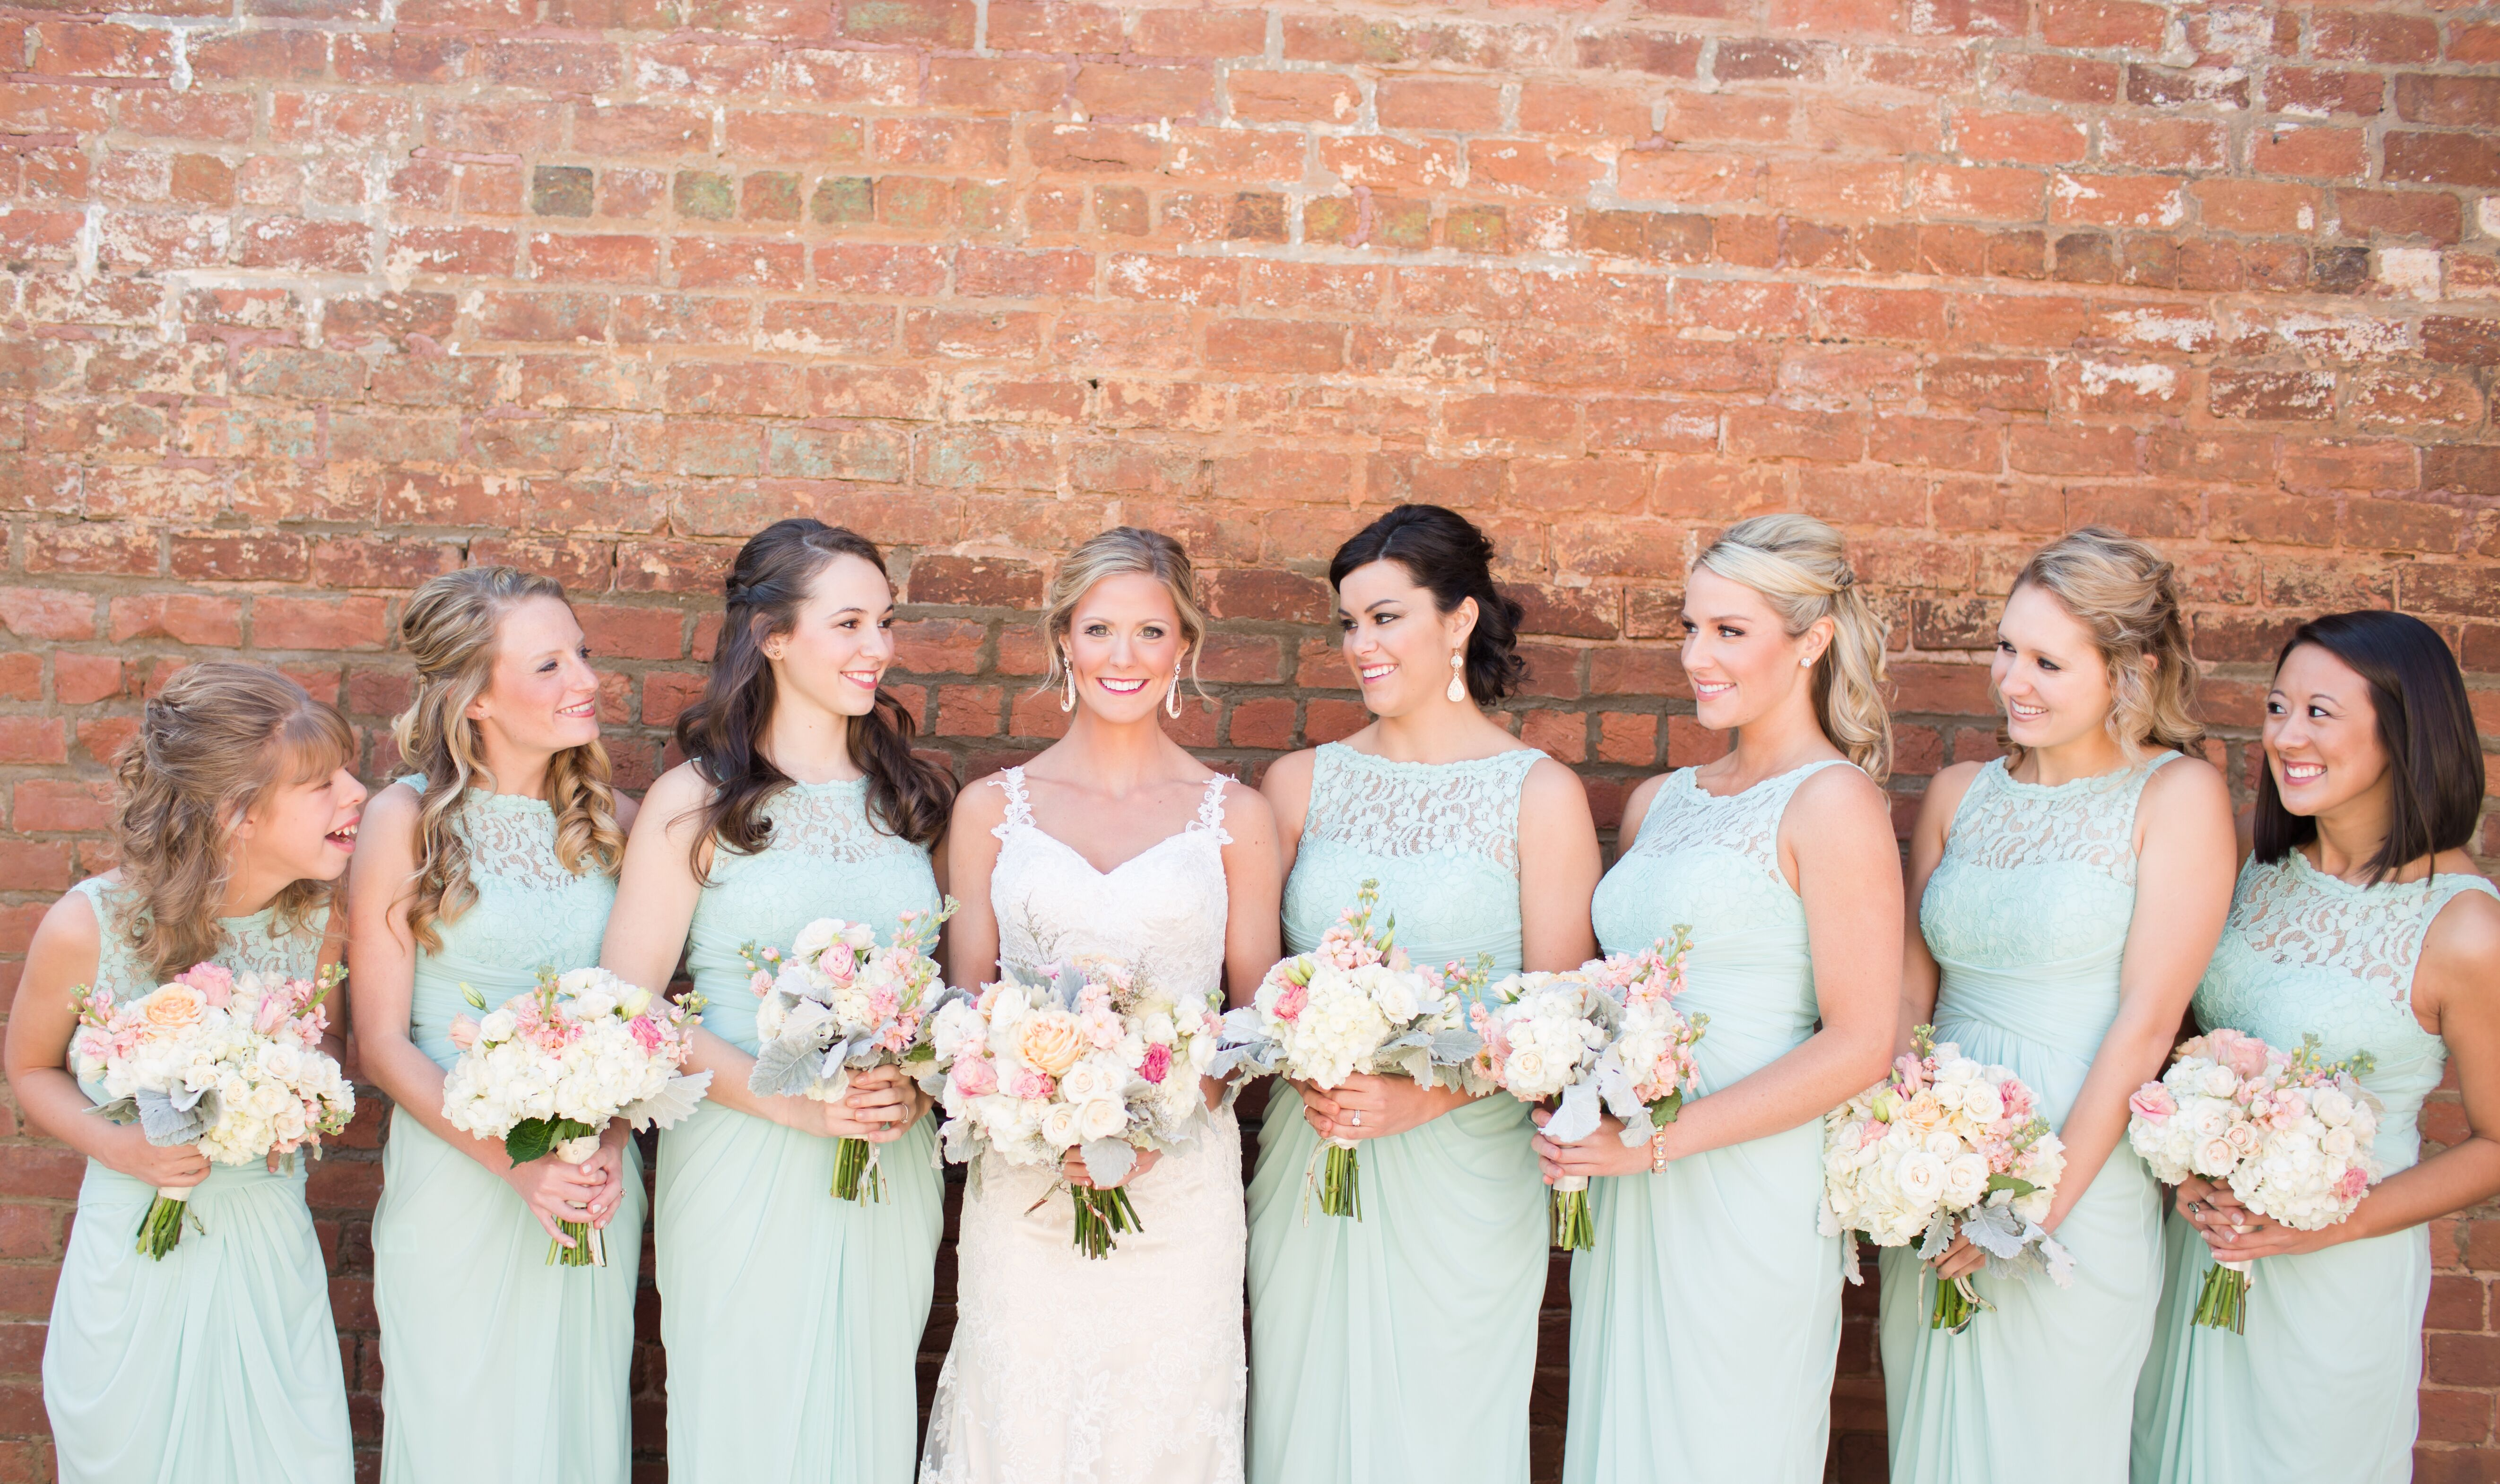 david s bridal wedding dress colors davids bridal wedding dresses Mint Bridesmaids Dresses David S Bridal Wedding Dress Ideas